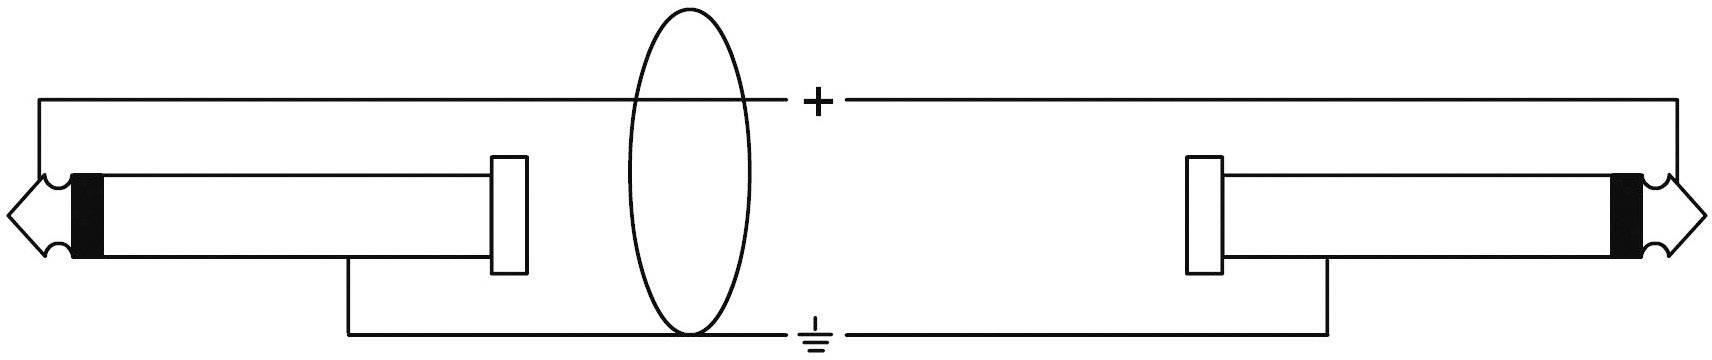 Kabel Cordial CPL 1,5 PP, [1x jack zástrčka 6,3 mm - 1x jack zástrčka 6,3 mm], 1.5 m, černá